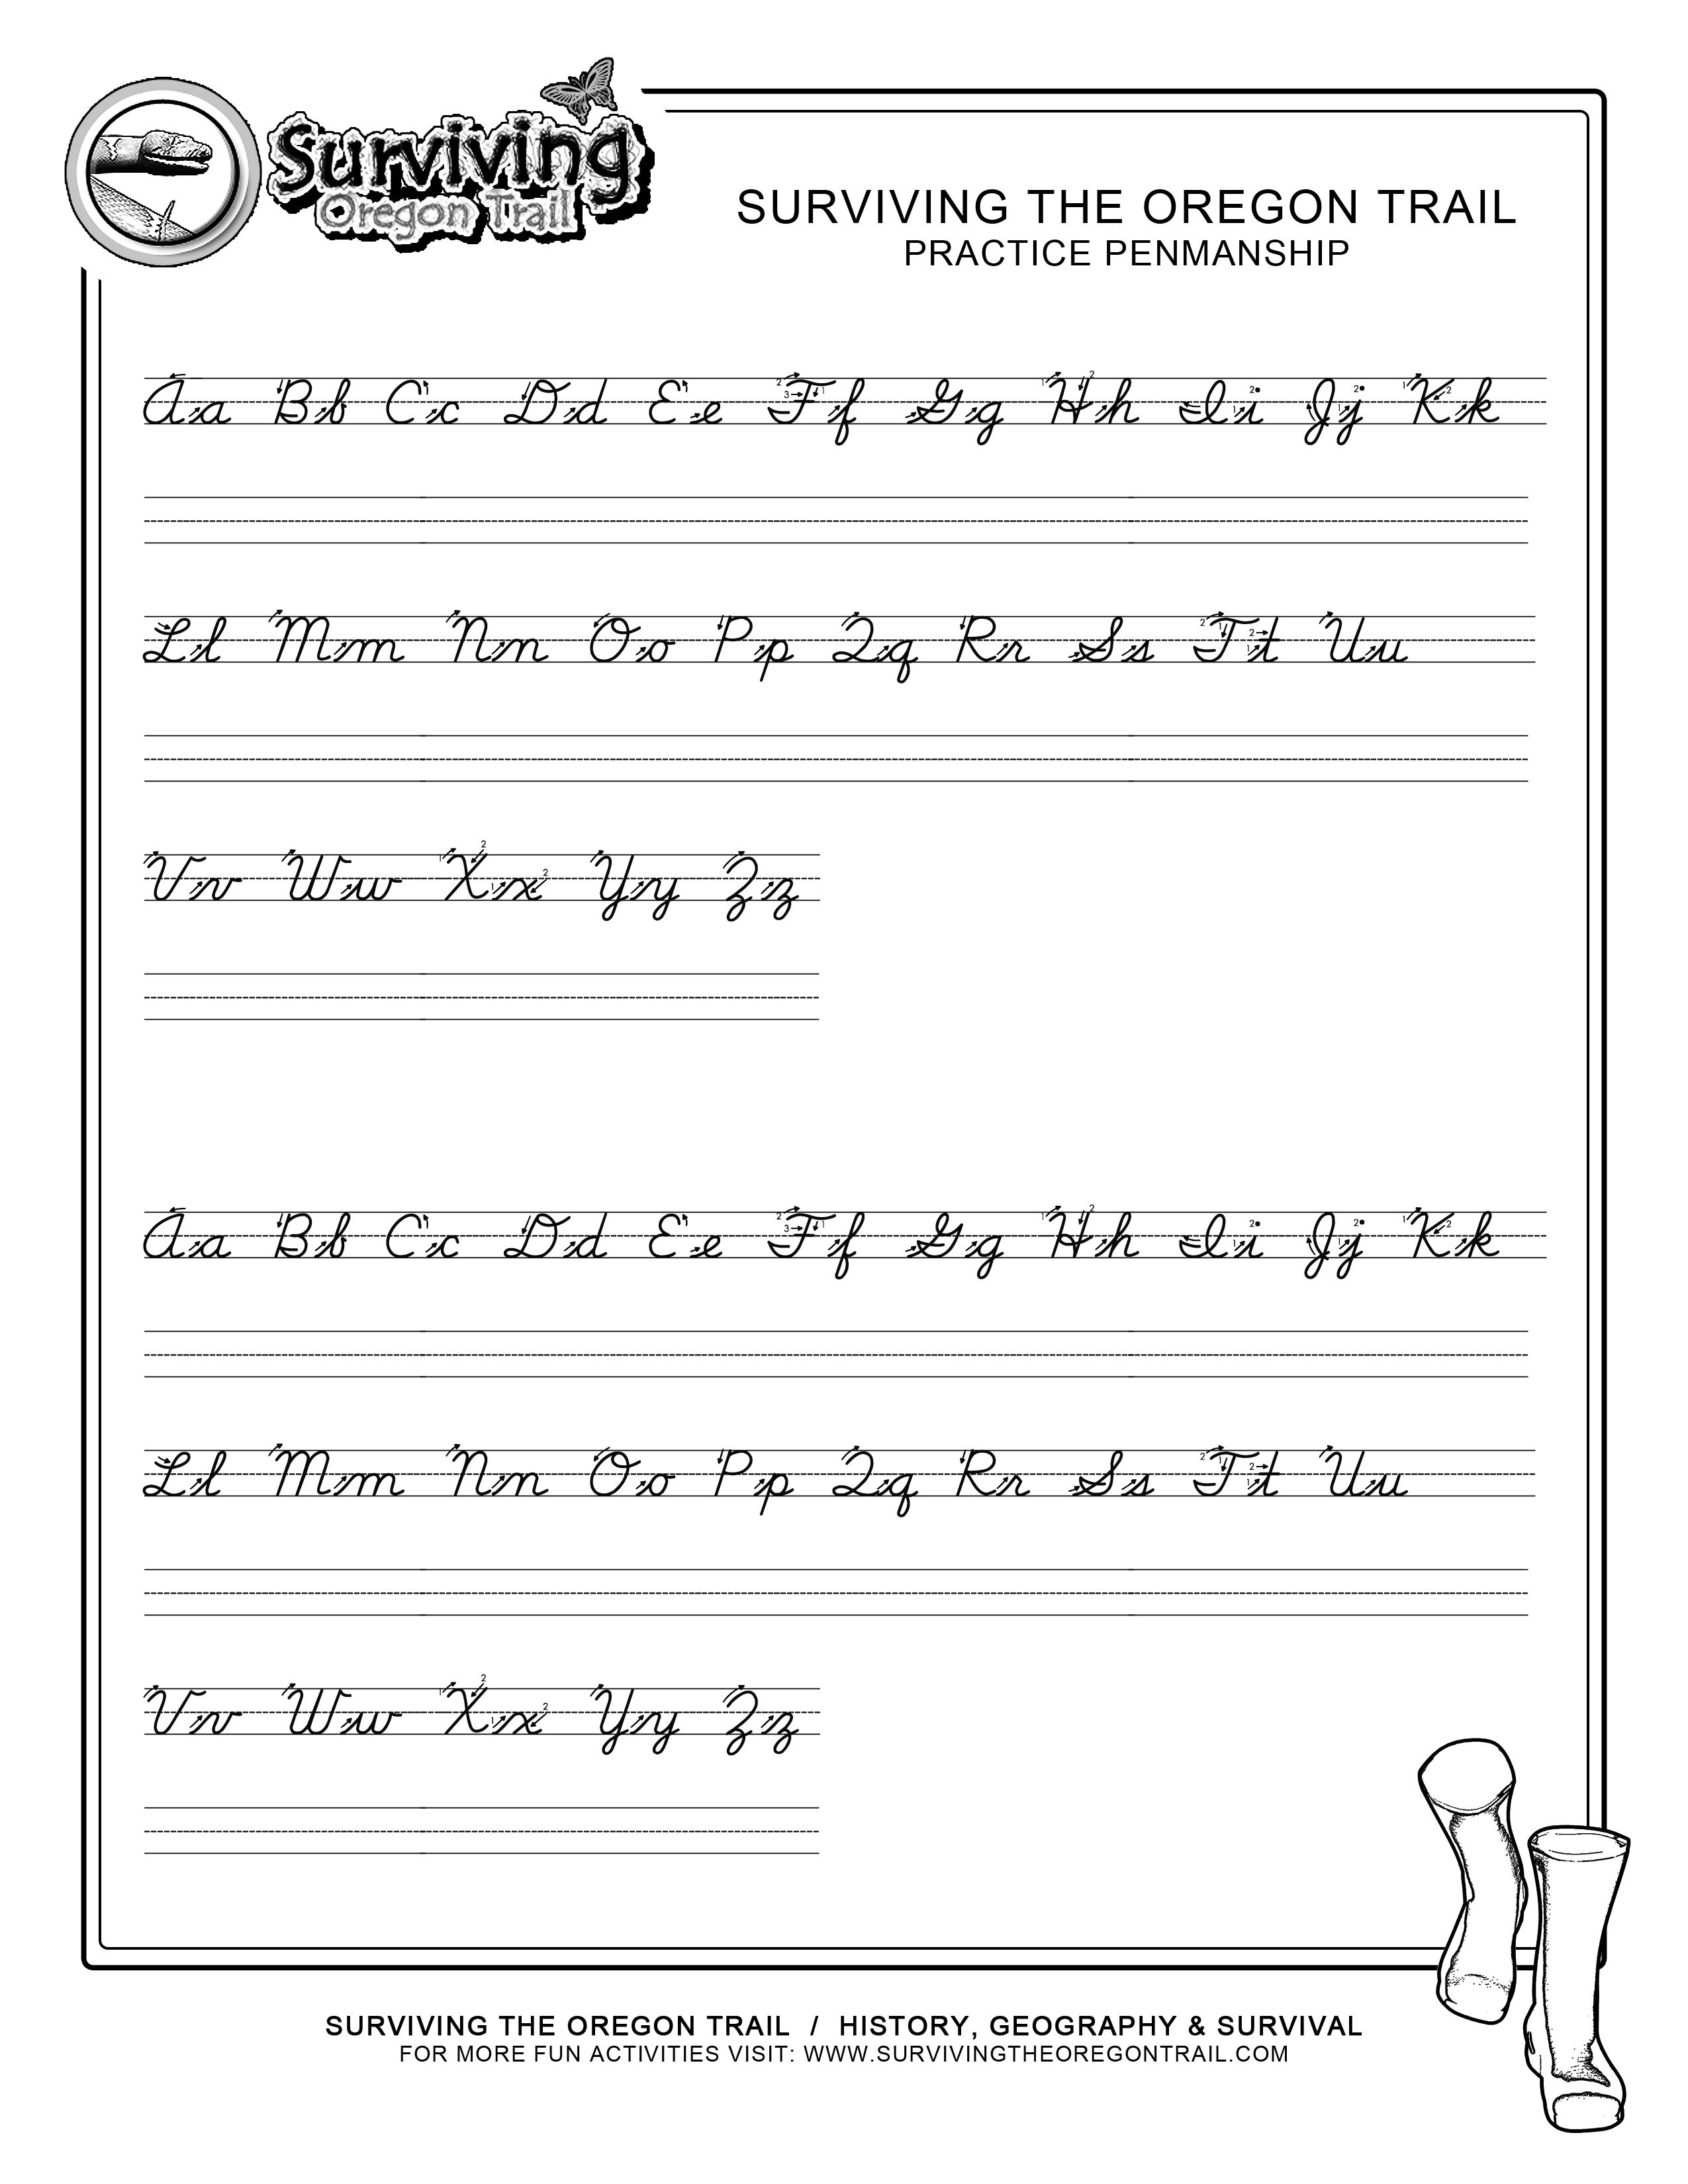 Practice Penmanship – Free Abc's Printable Cursive Writing Worksheet - Free Printable Writing Worksheets